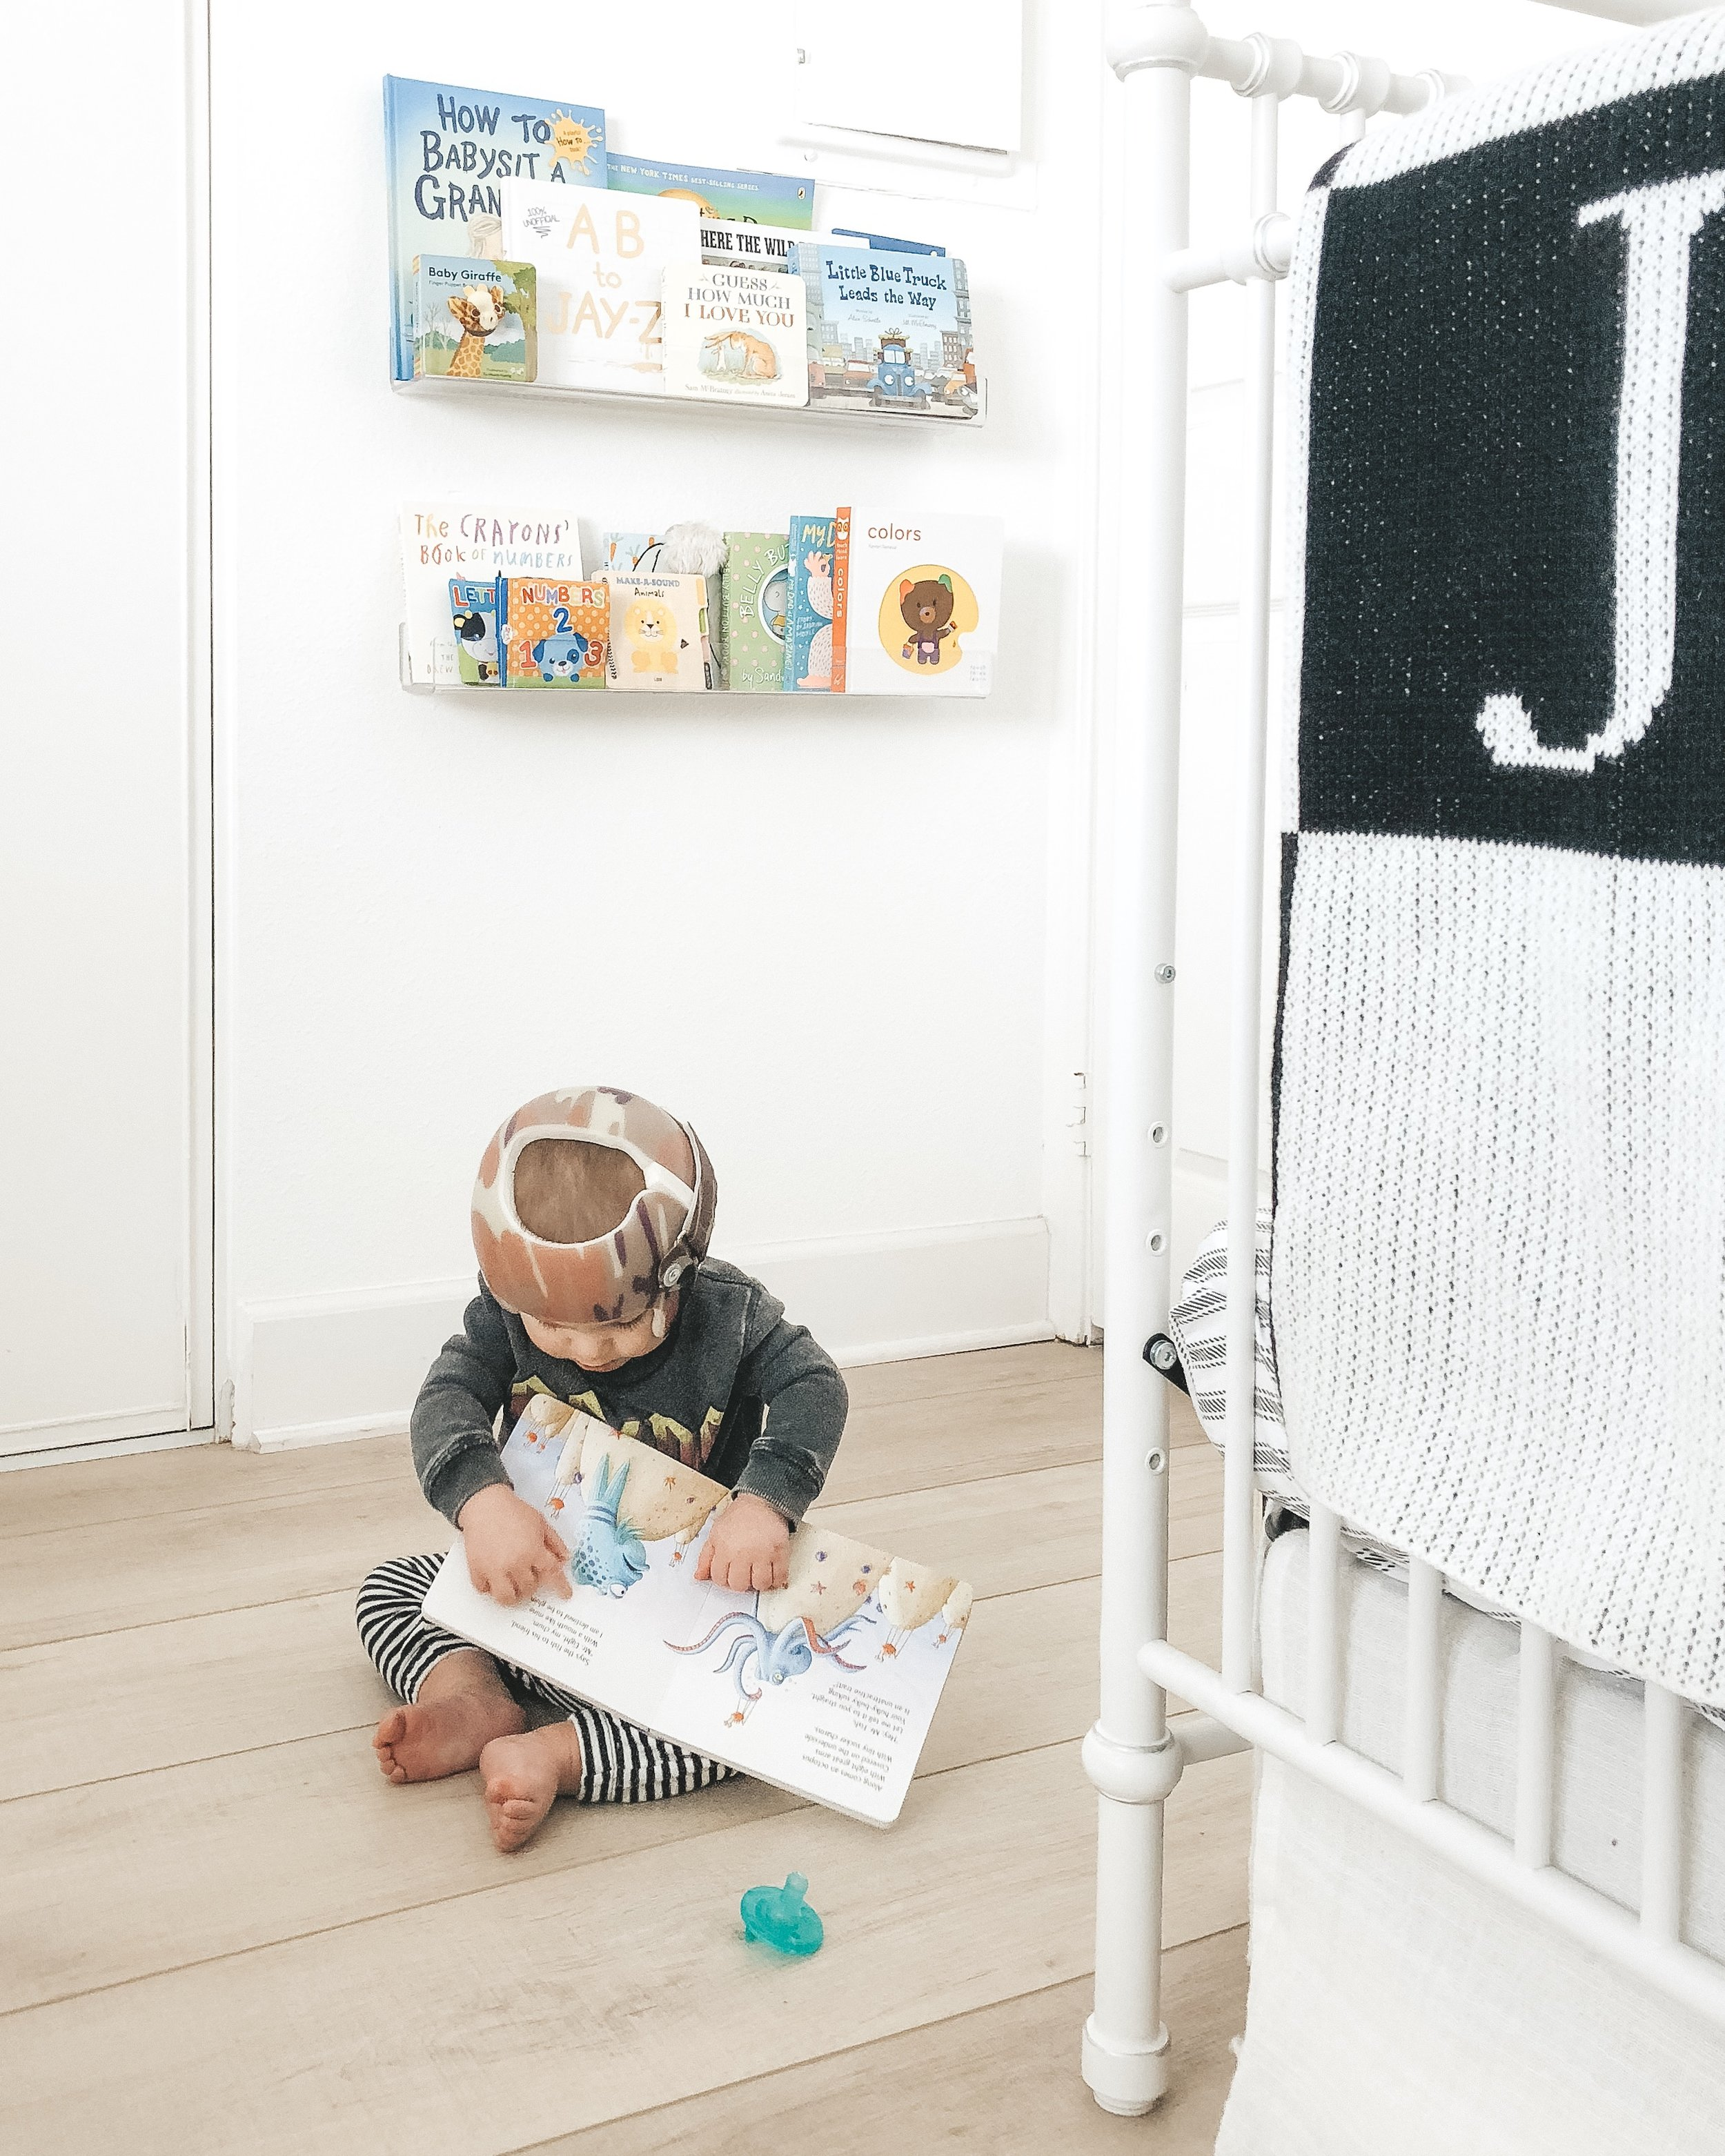 Jett Jones 10 month update.  Clear bookshelves.  Neutral boy nursery.  Black and white nursery. Helmet treatment for Plagiocephaly aka flat head.